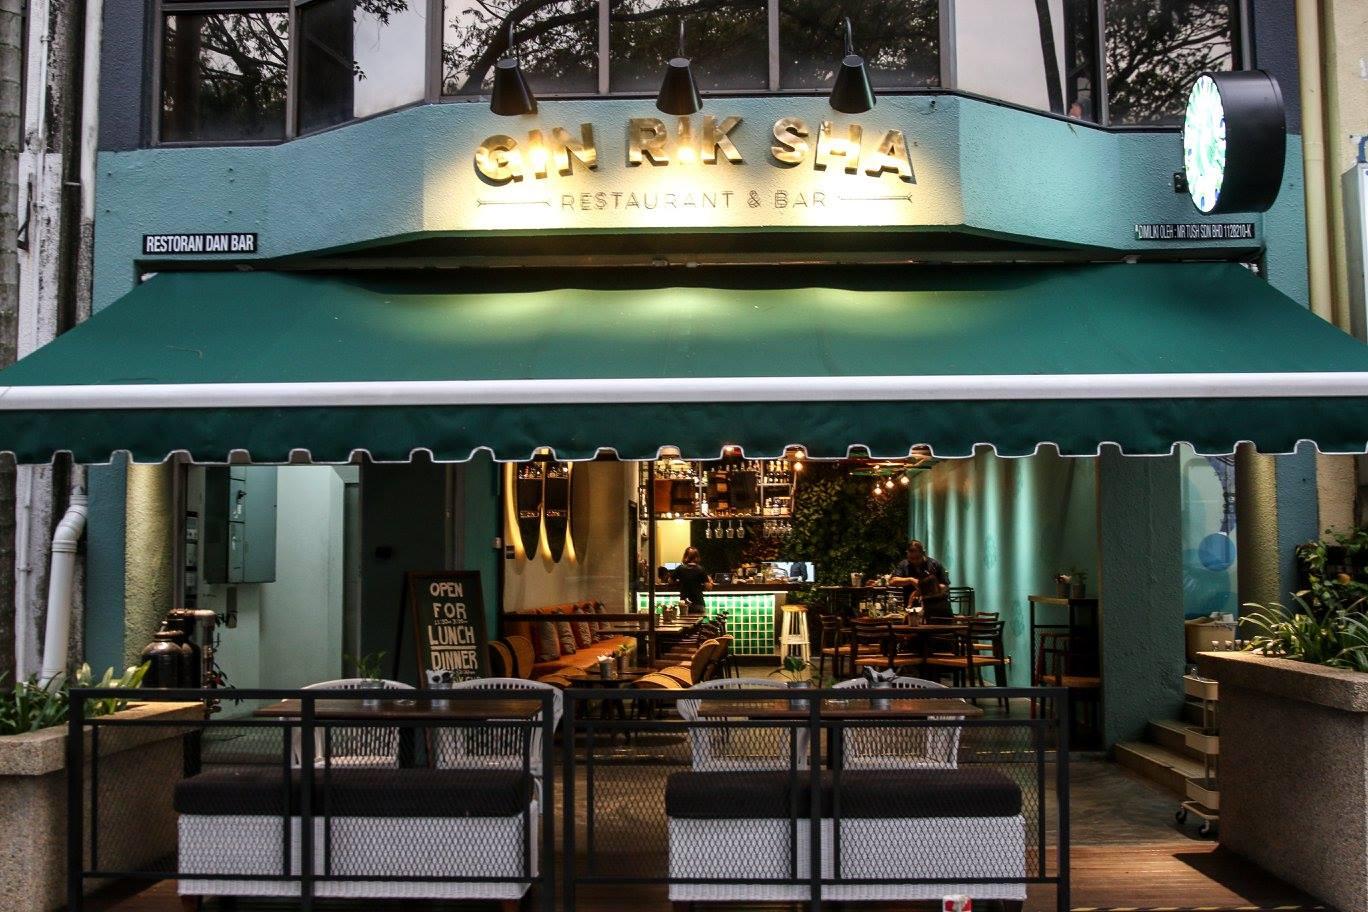 Lnk Food Plaza Menu